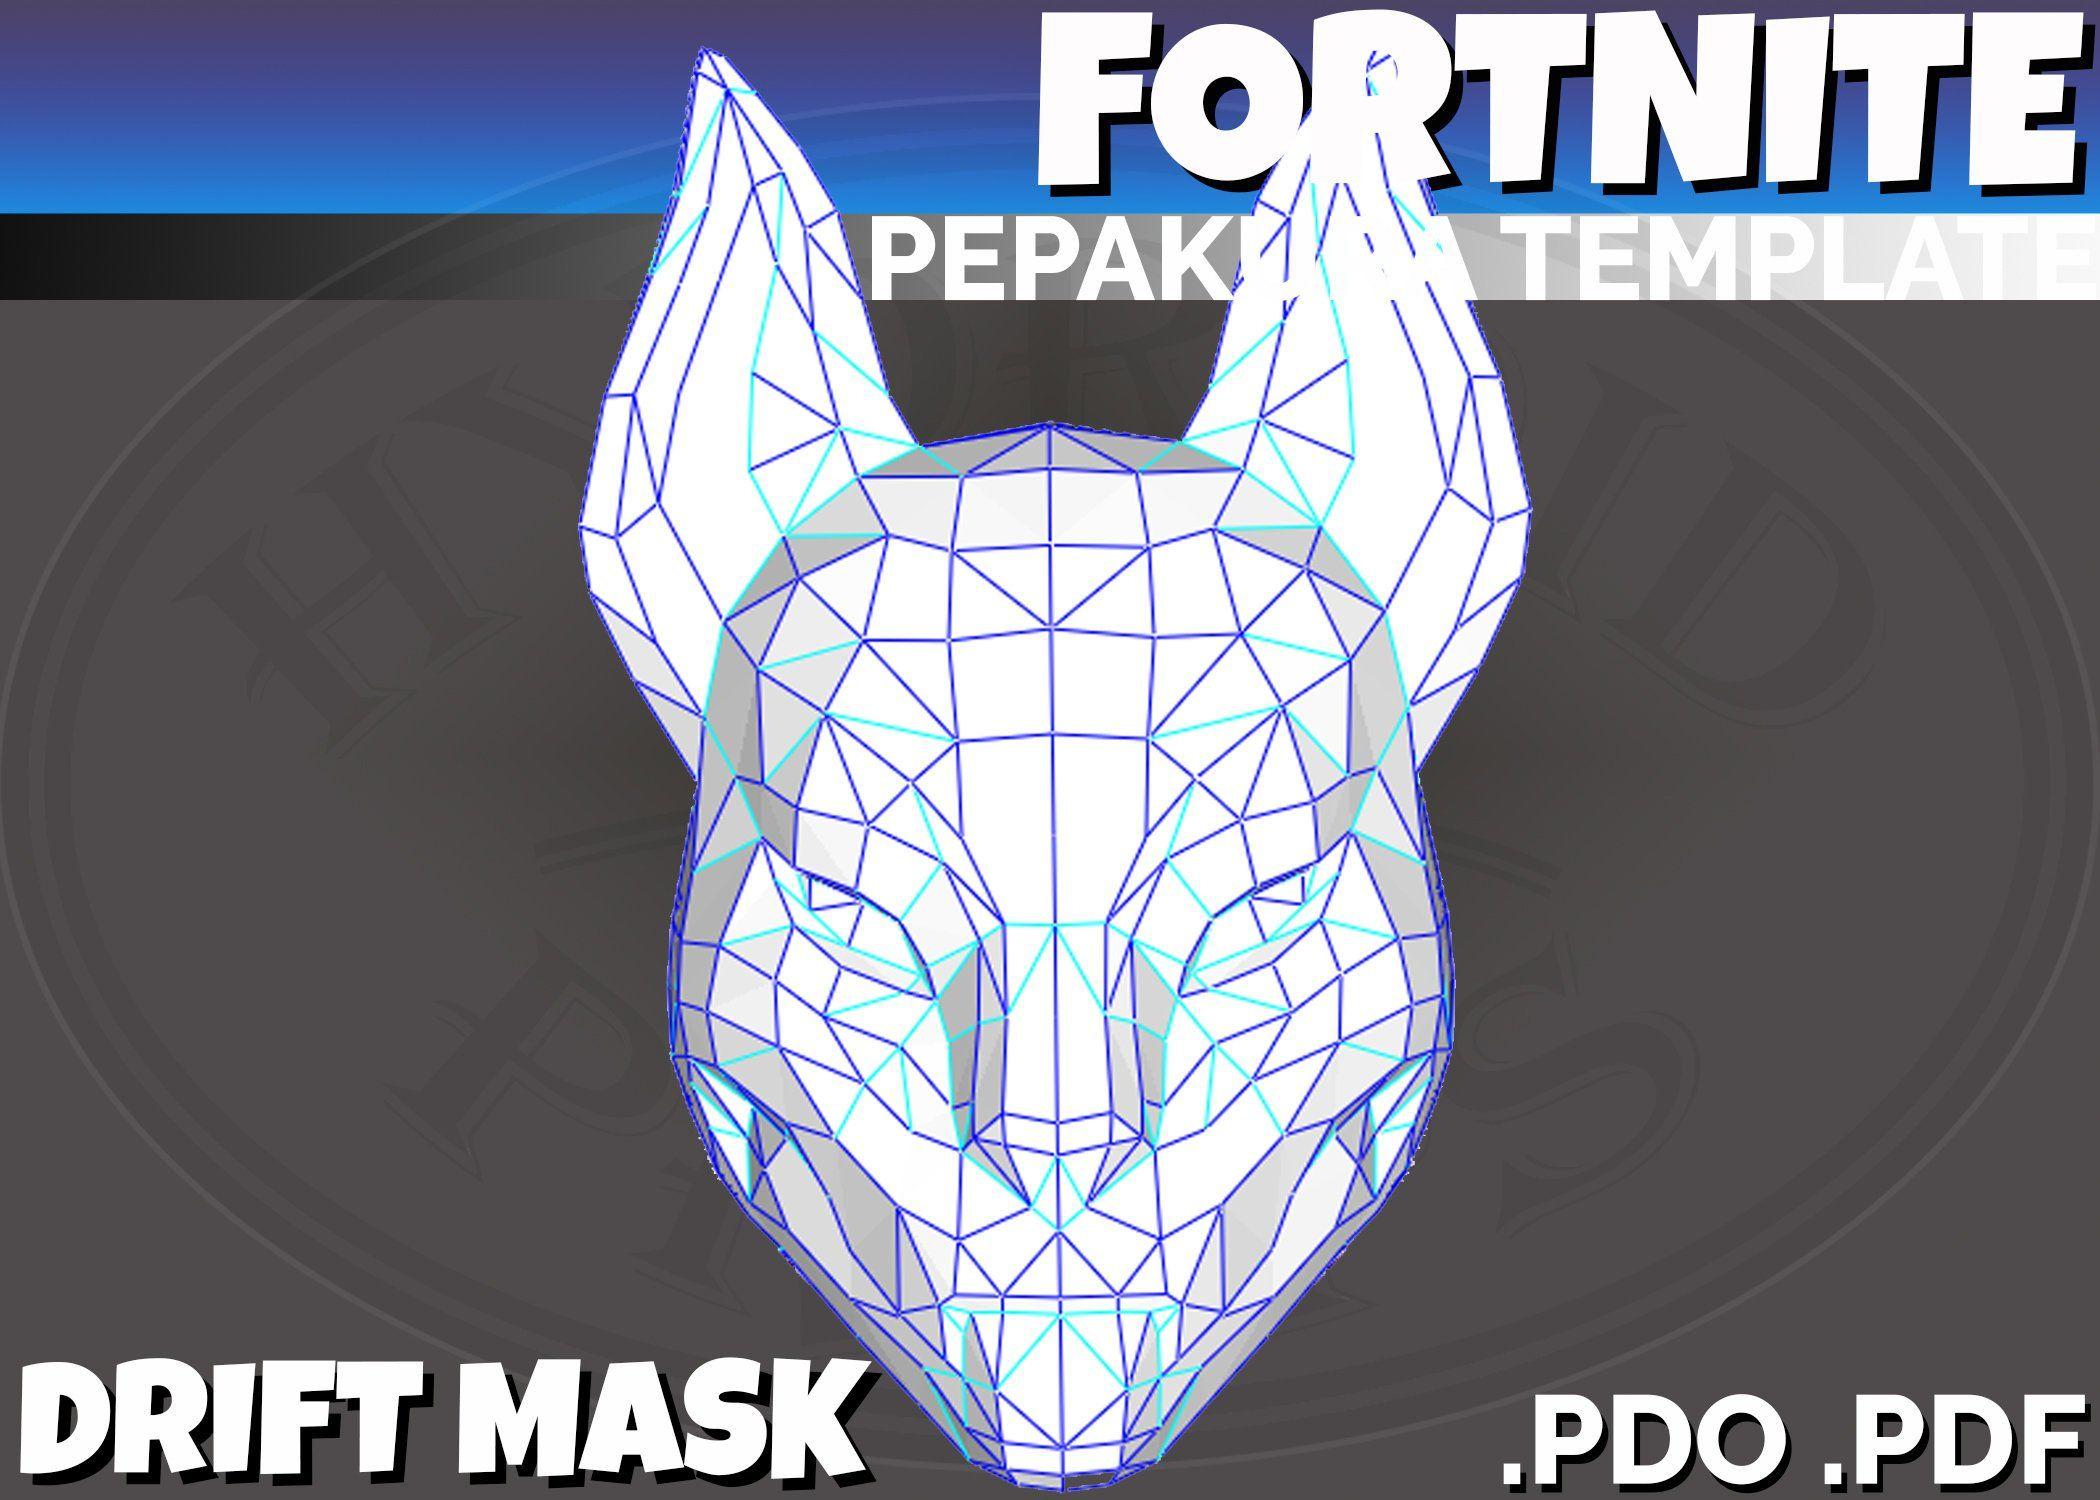 Template Fortnite Papercraft